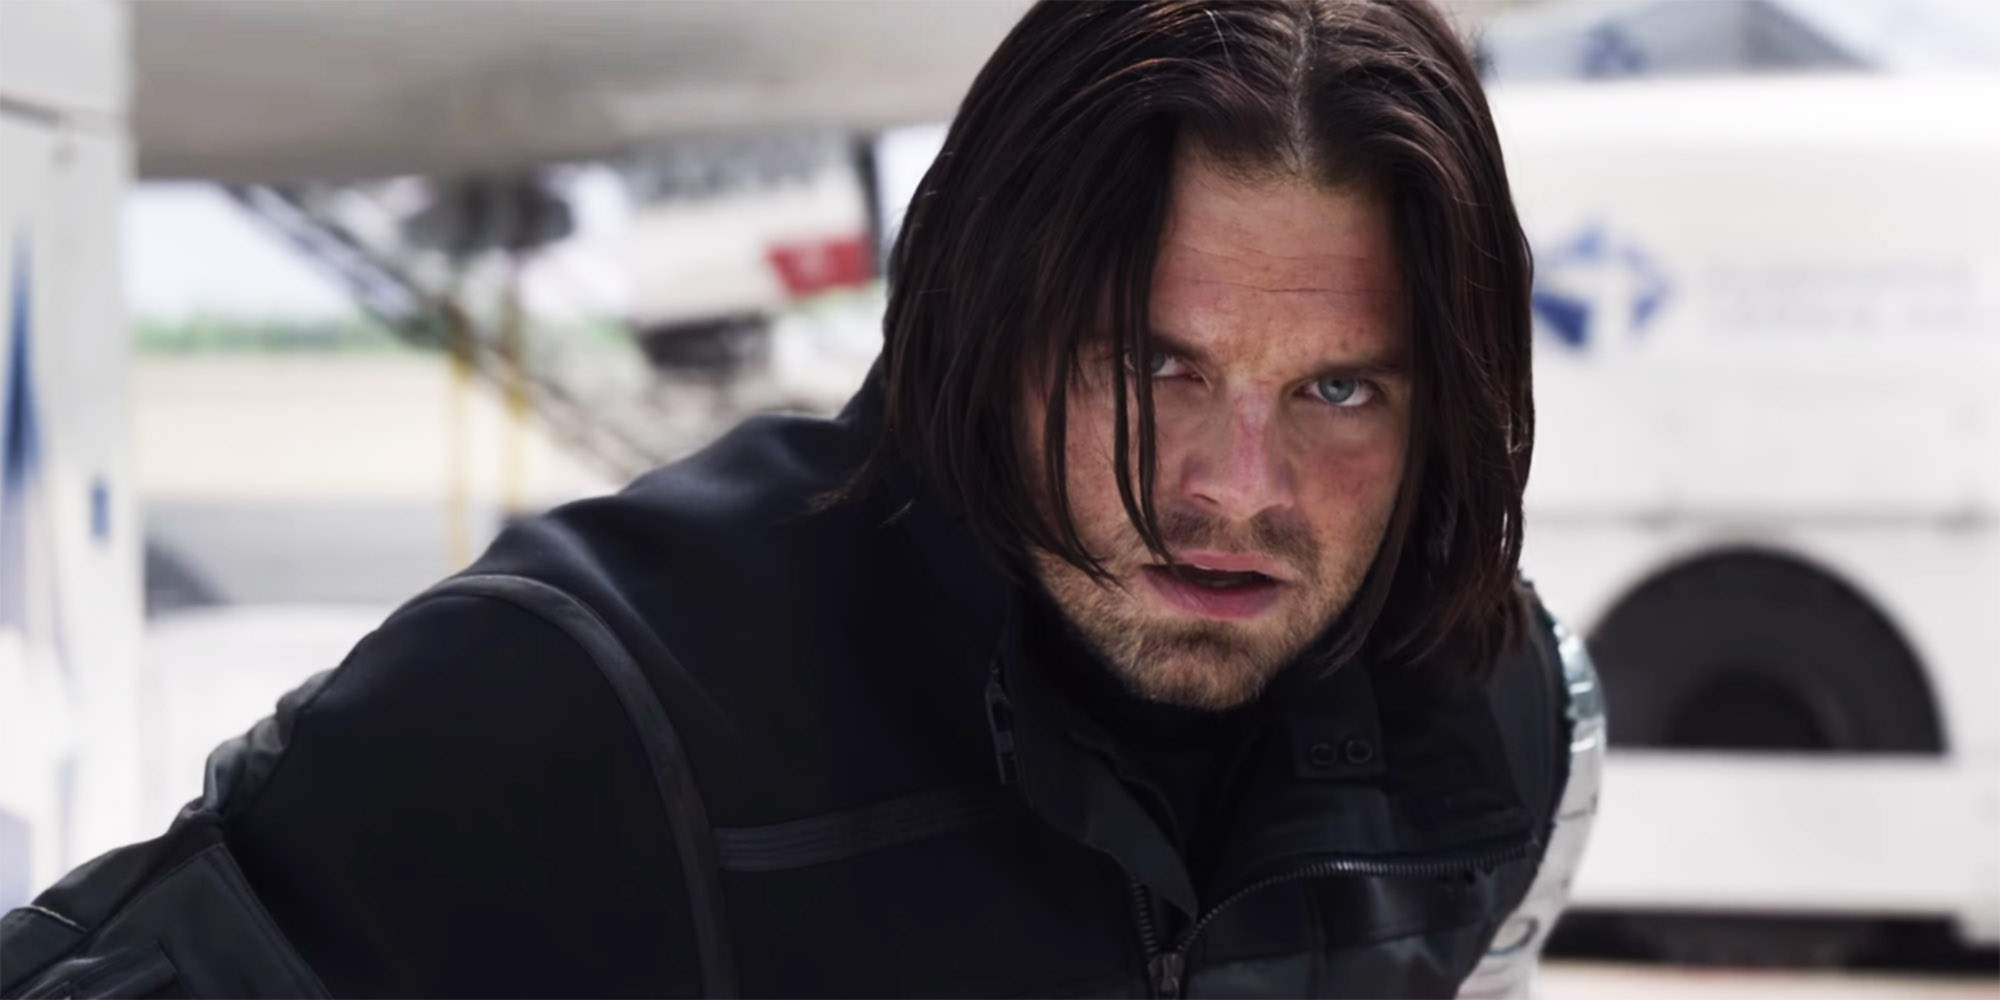 Bucky Barnes in Captain America: Civil War